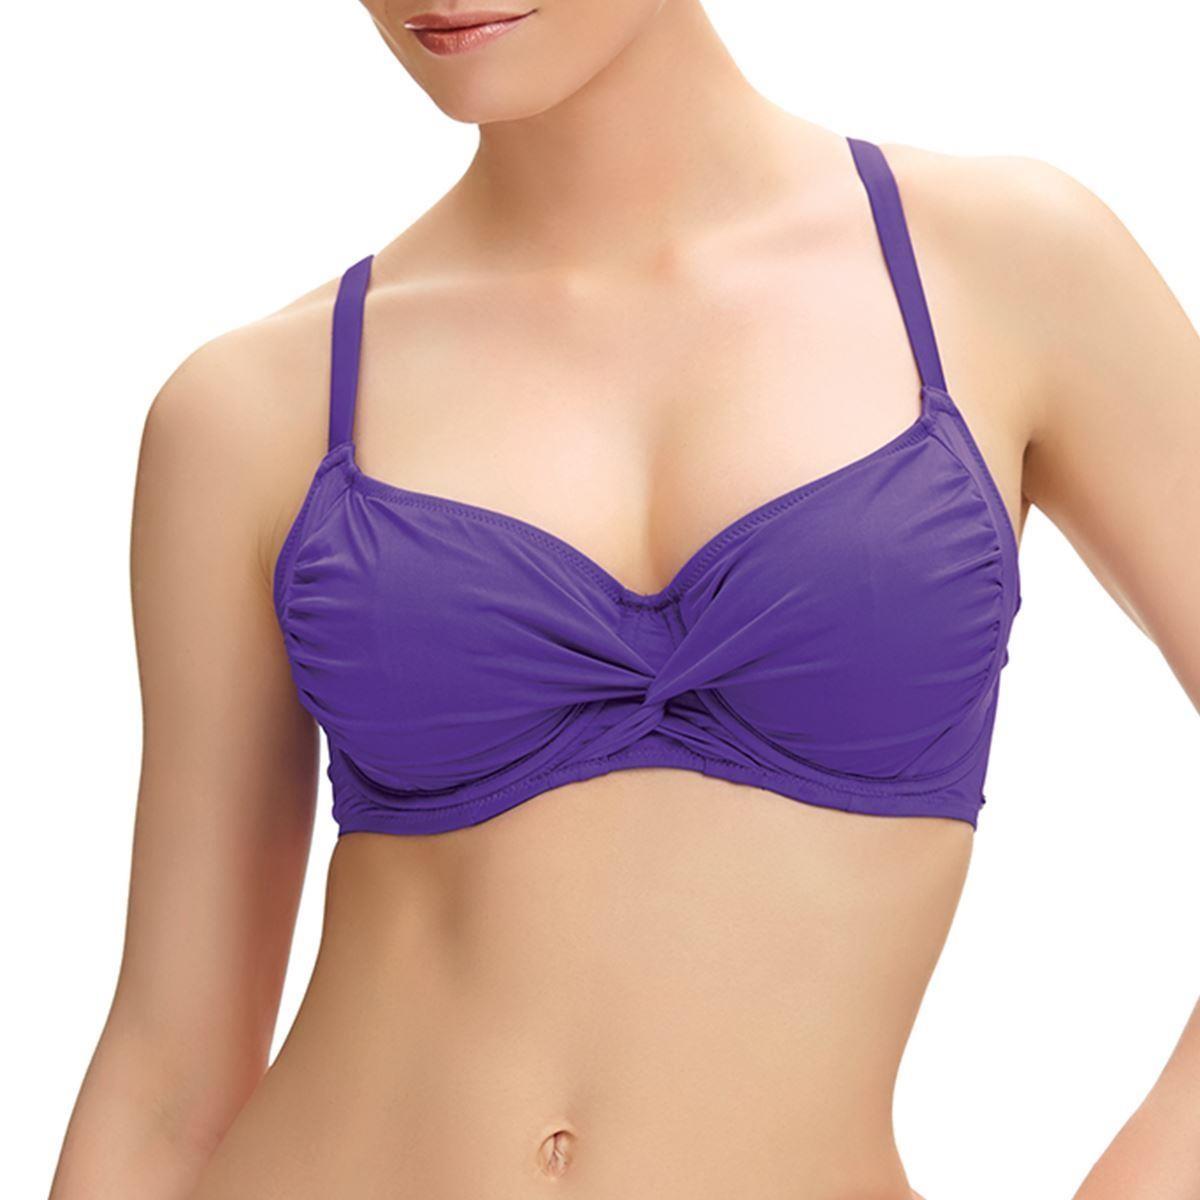 Fantasie Los Cabos Twist Front Full Cup Bikini Top - Violet